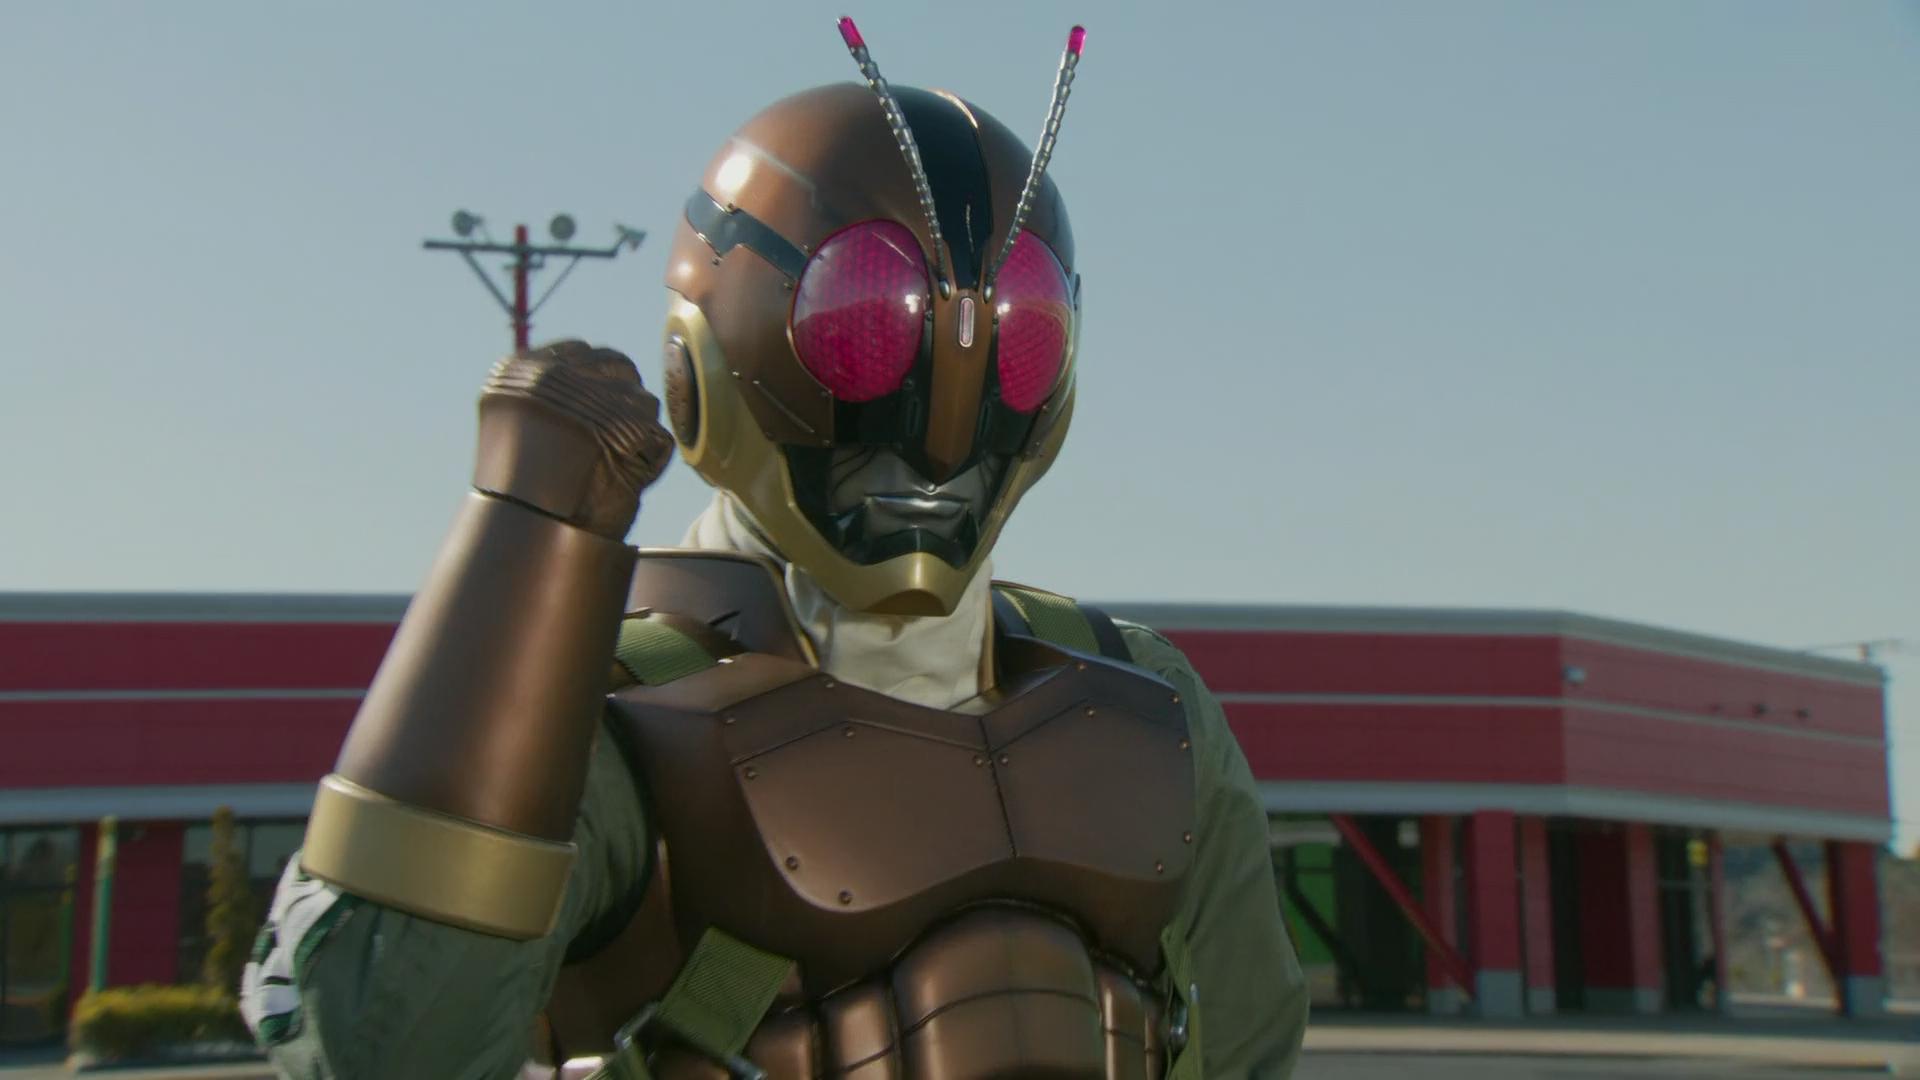 Kamen Rider 4 (character) | Kamen Rider Wiki | FANDOM